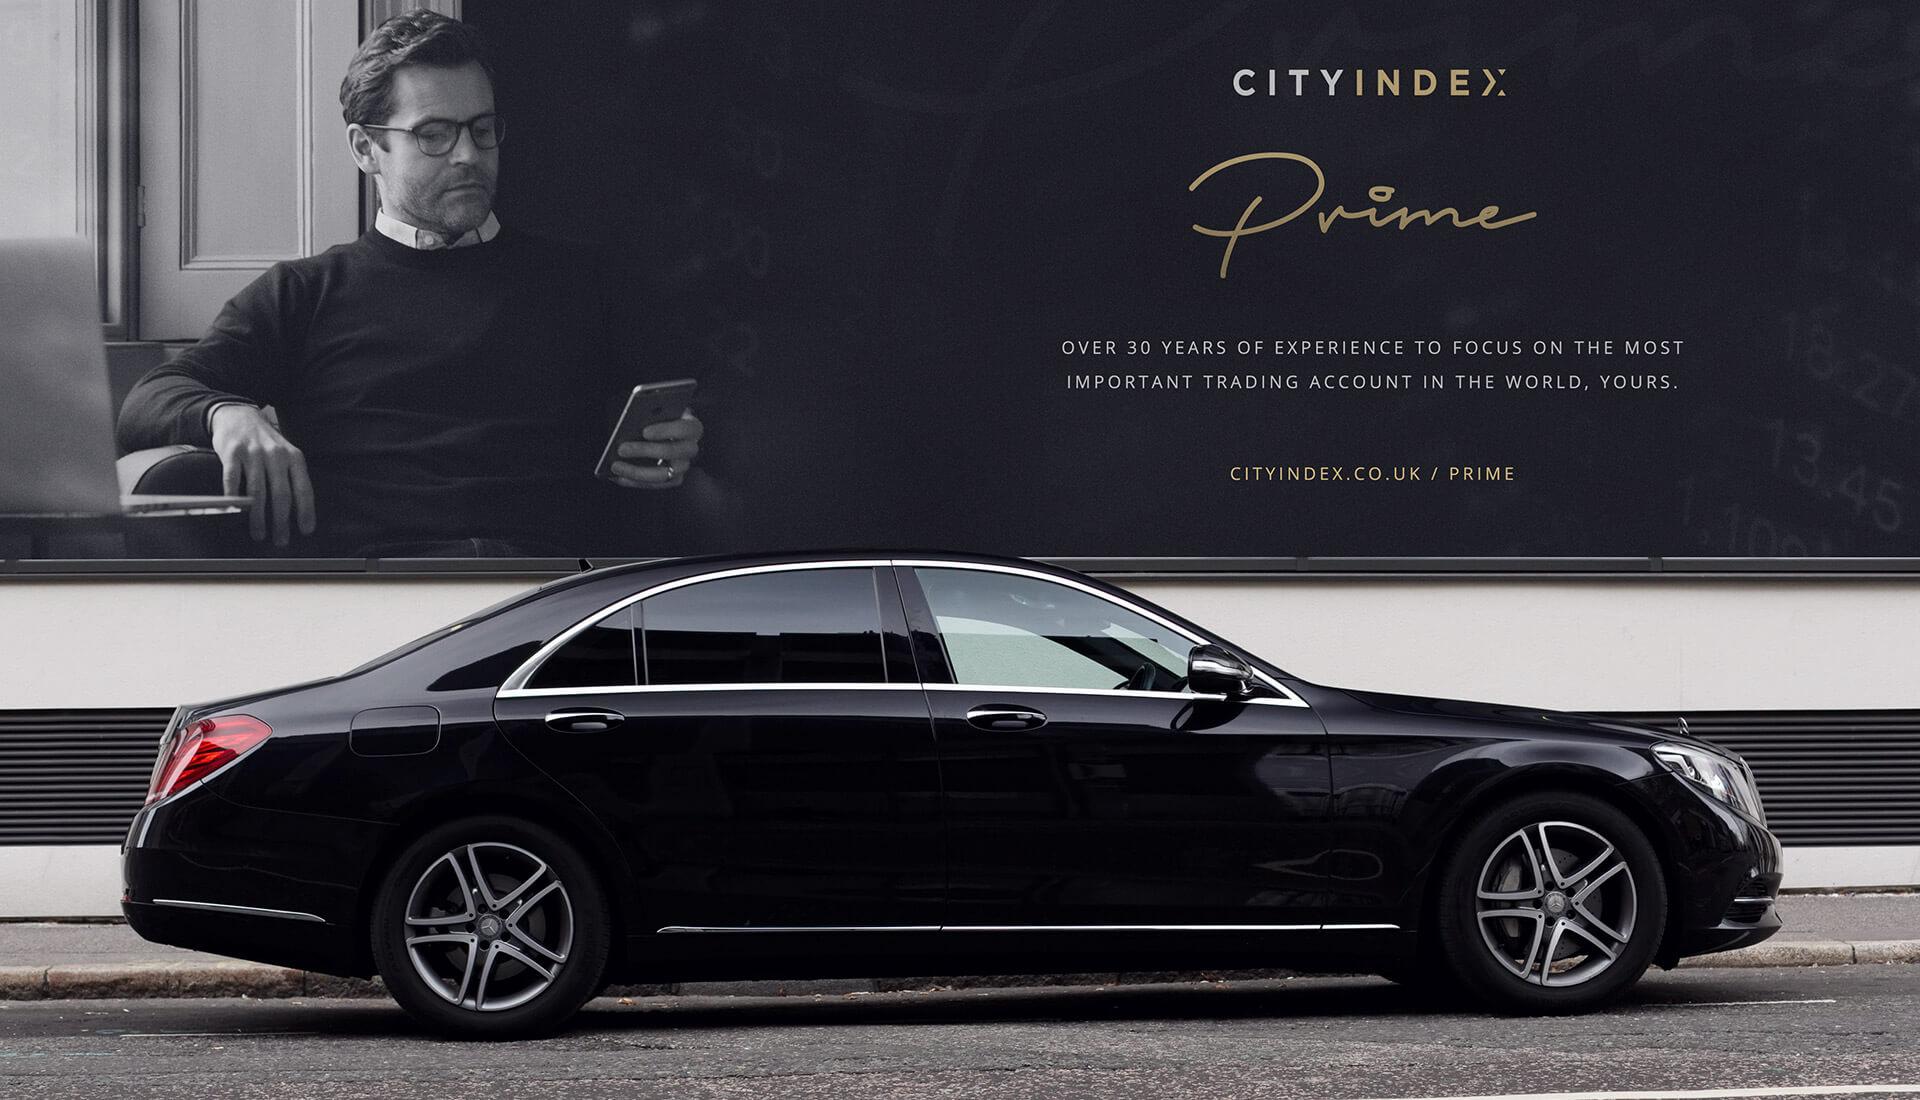 CityIndex_Prime_3.jpg